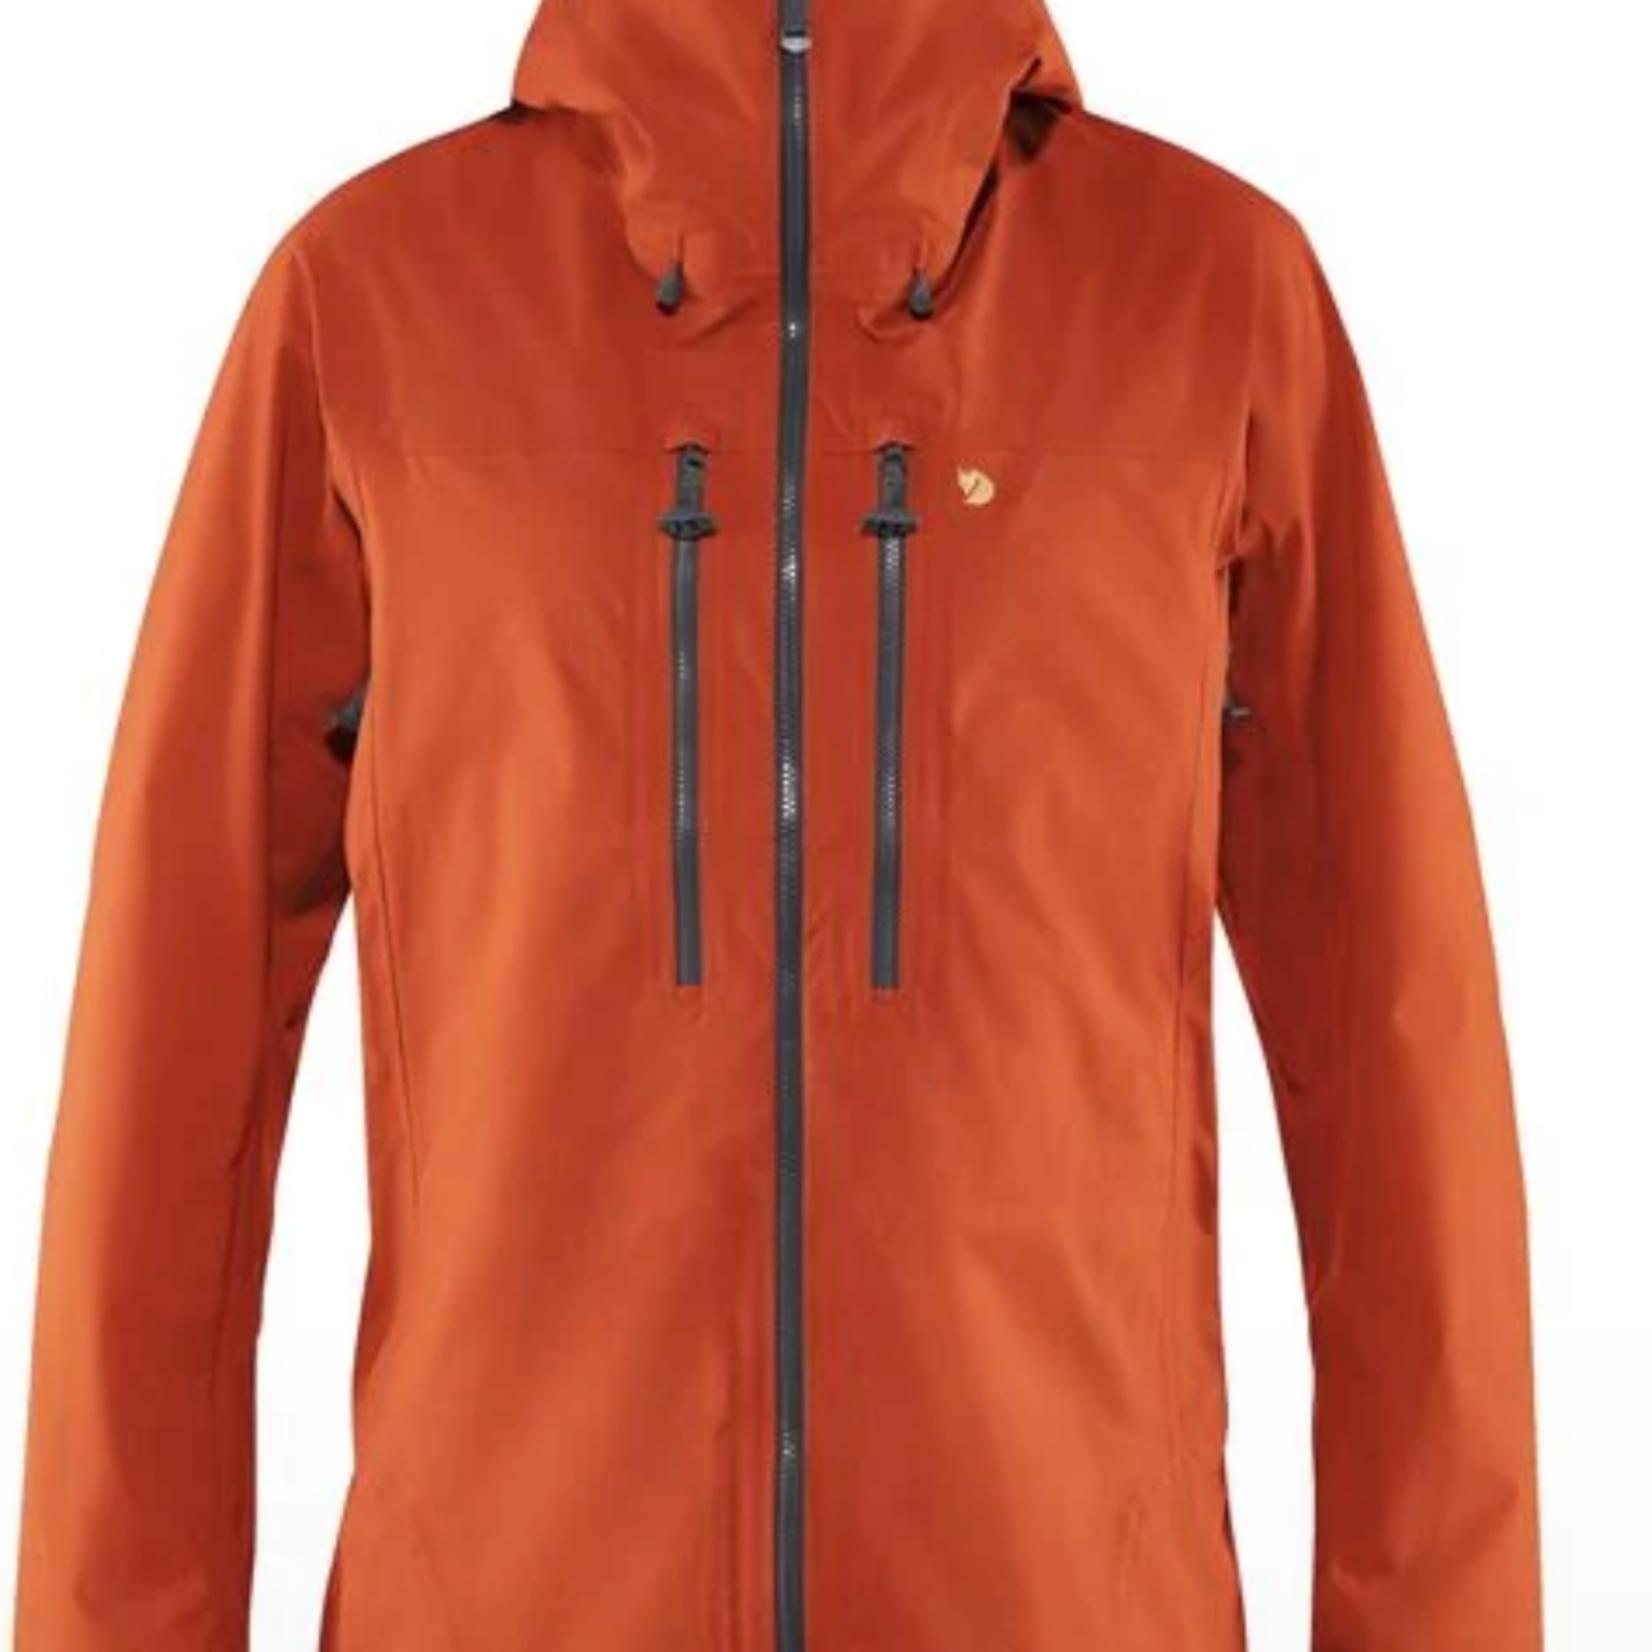 Fjallraven Fjallraven  Bergtagen Eco-Shell Jacket